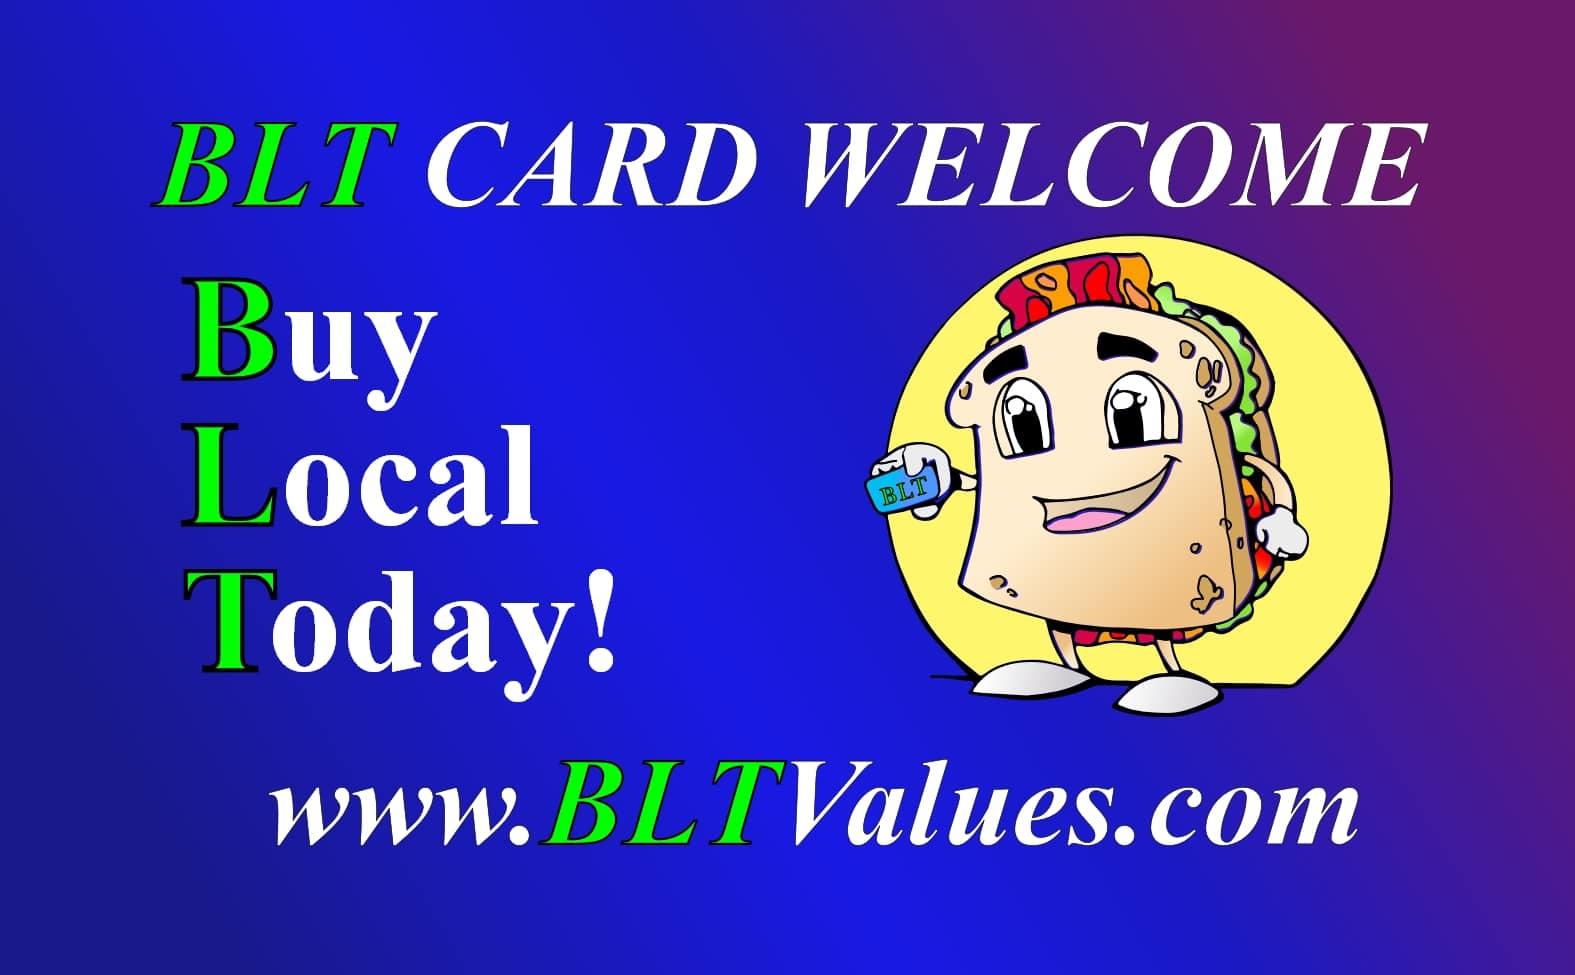 bltcard4614